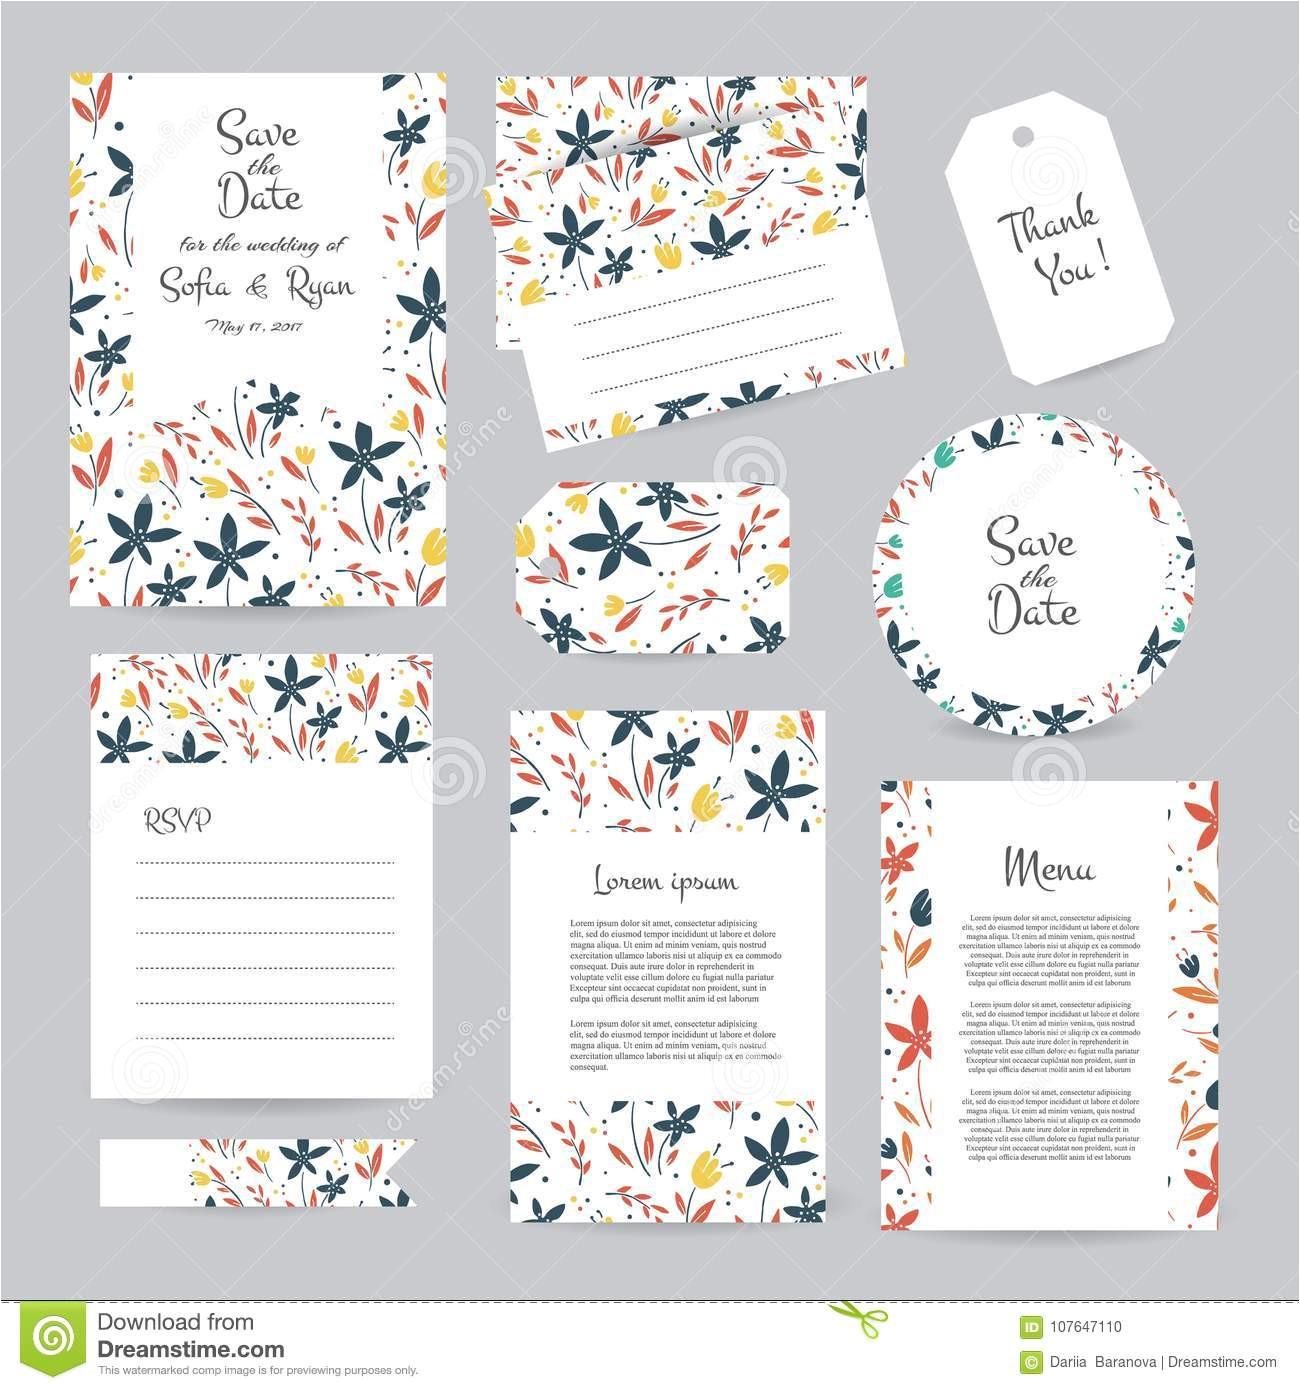 vector gentle wedding cards template flower design invitation save date rsvp menu thank you card bridal set 107647110 jpg